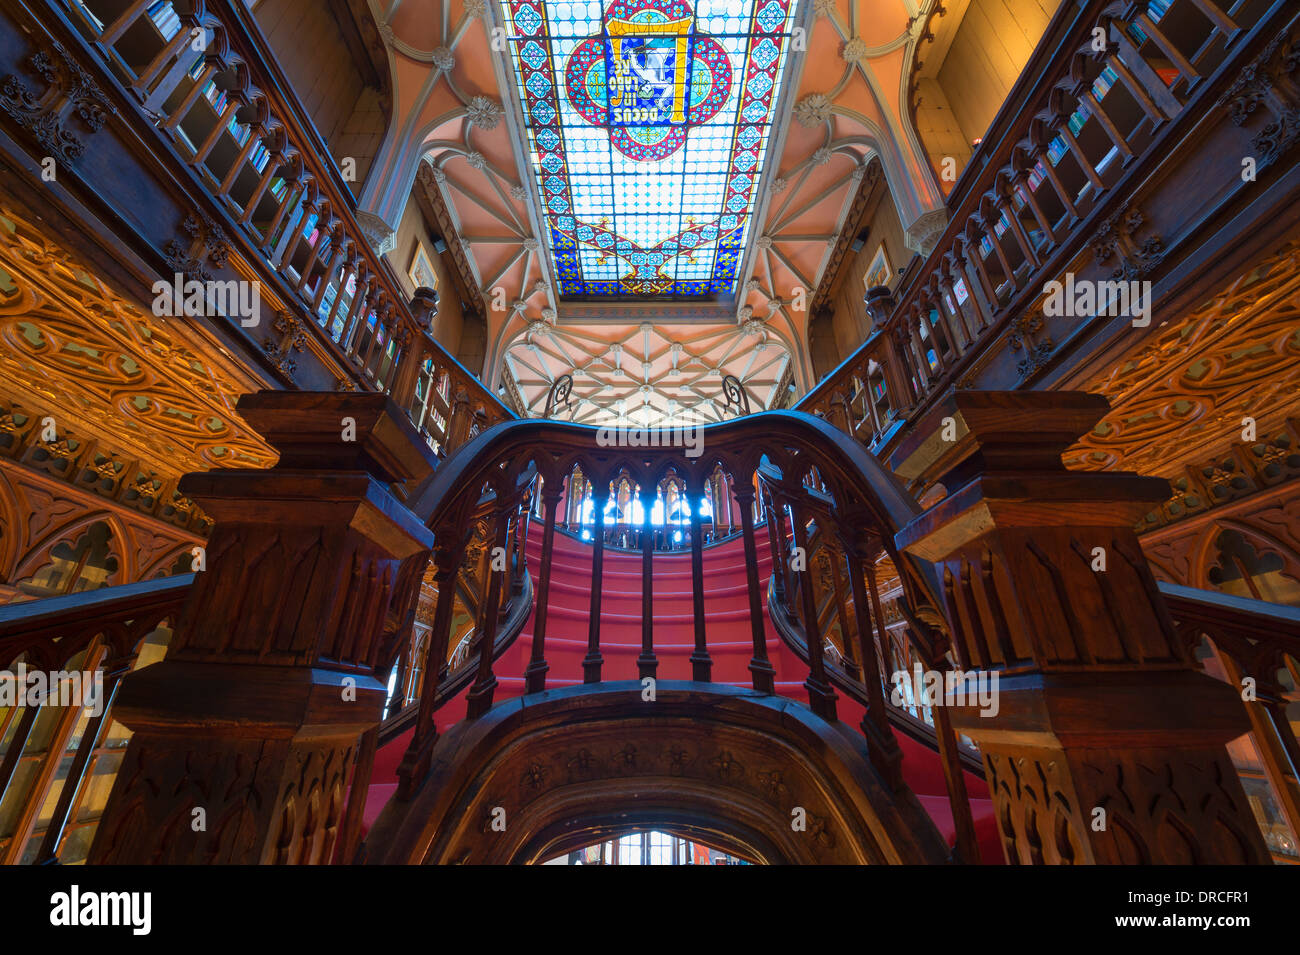 Lello and Irmao bookshop, Spiral stairs, Oporto, Portugal - Stock Image